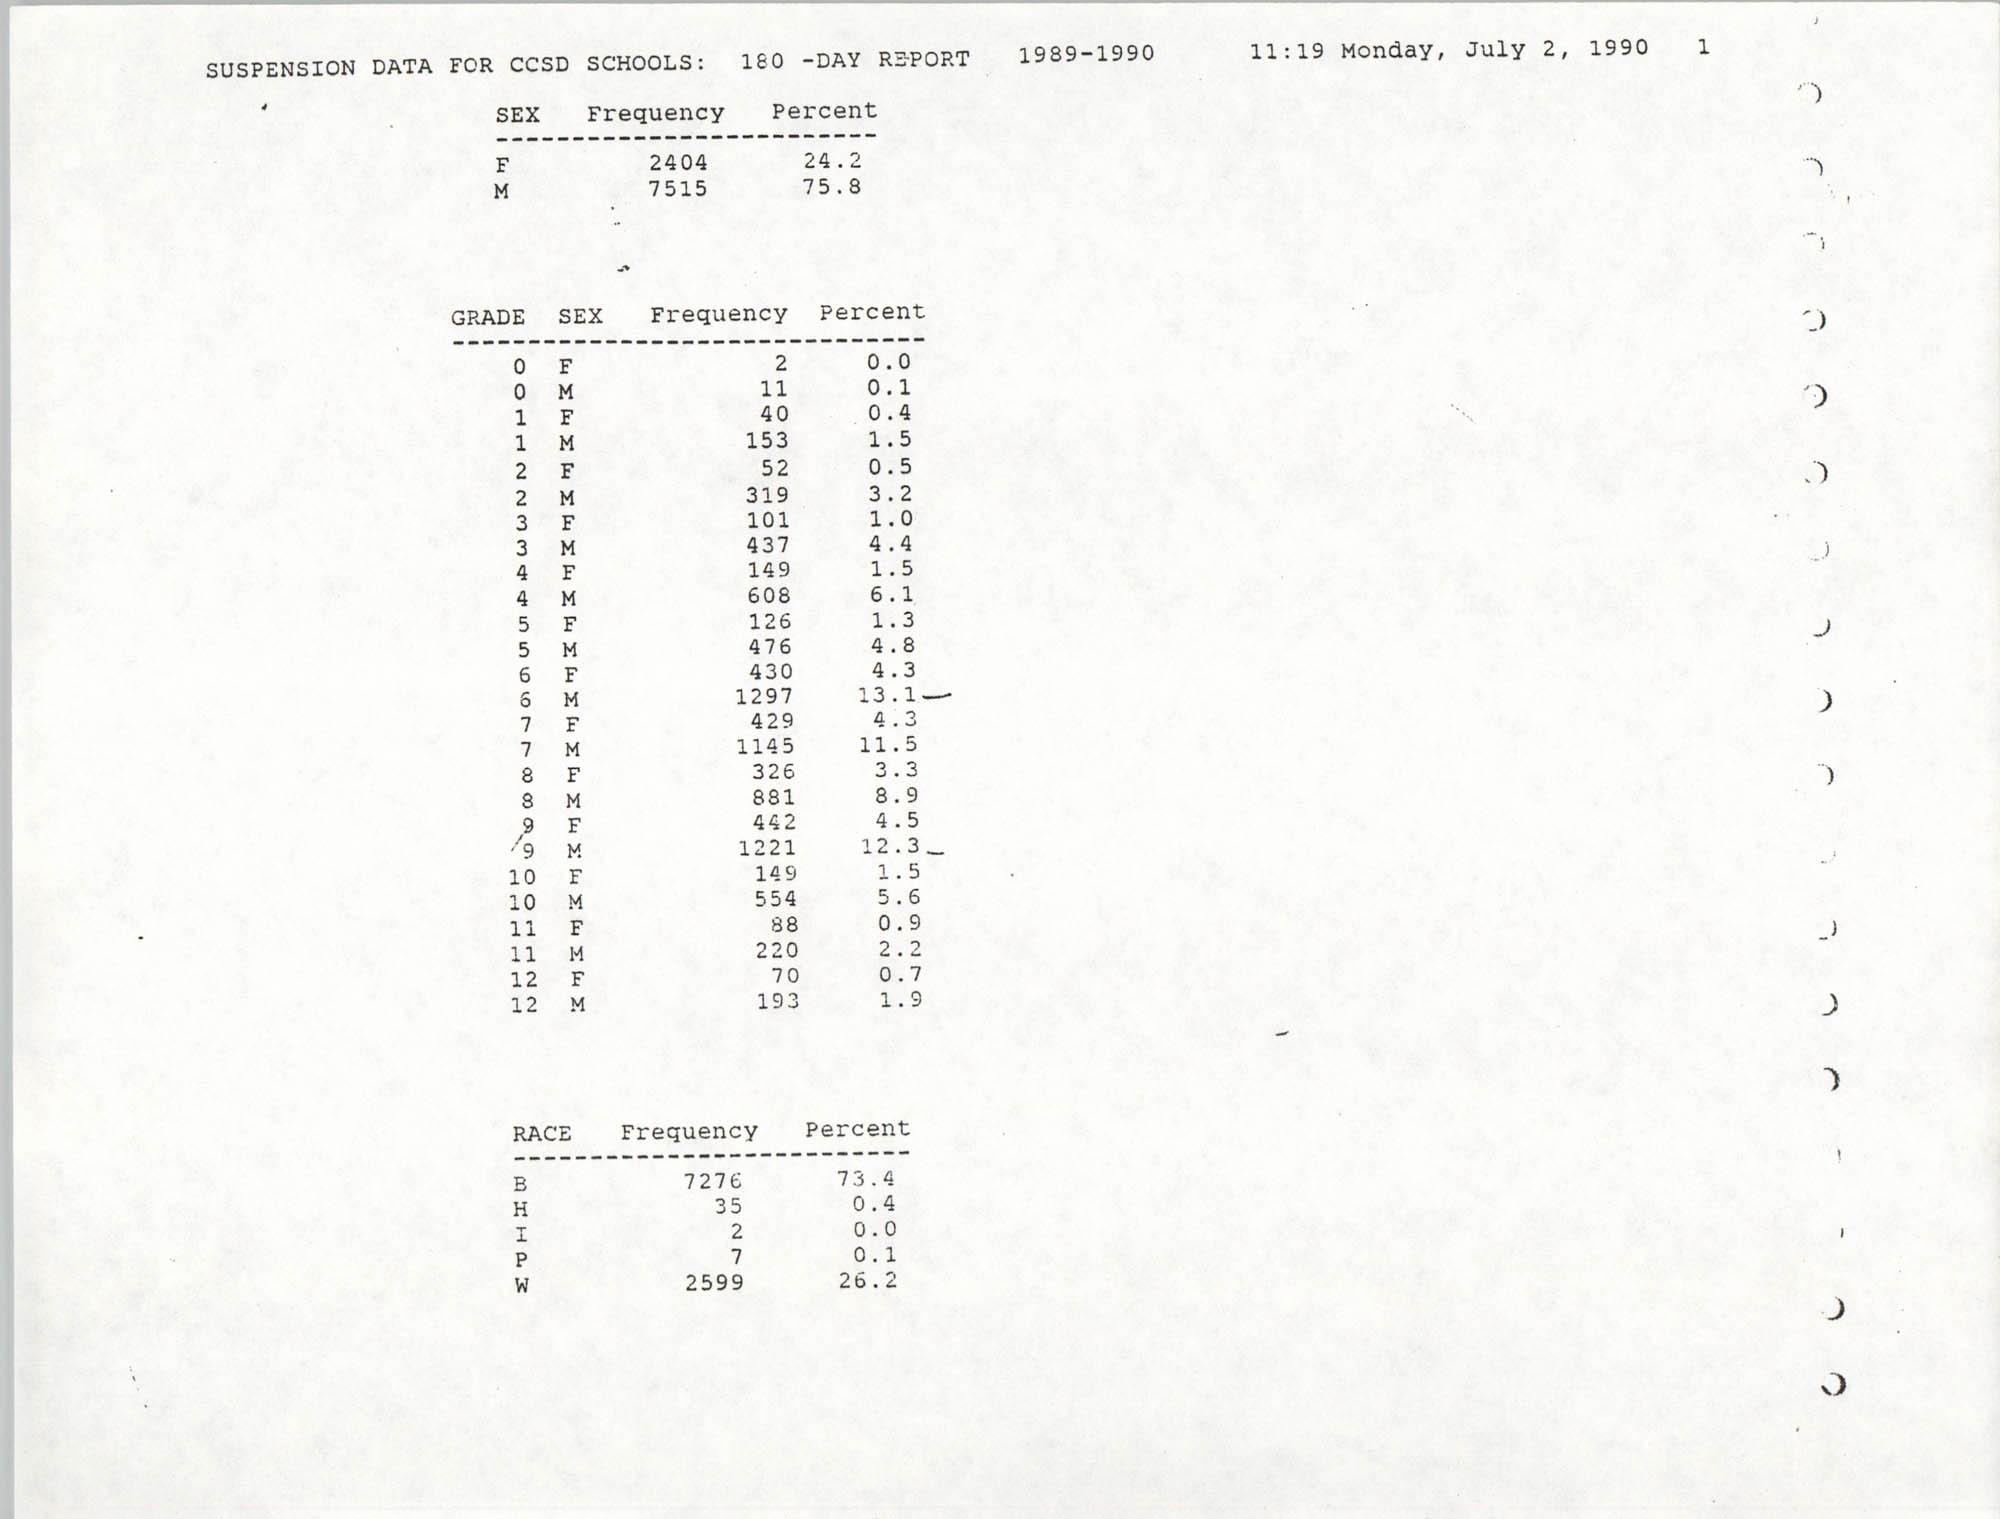 Data for Charleston County School District Schools, 1989-1990, Suspension Data, Page 1